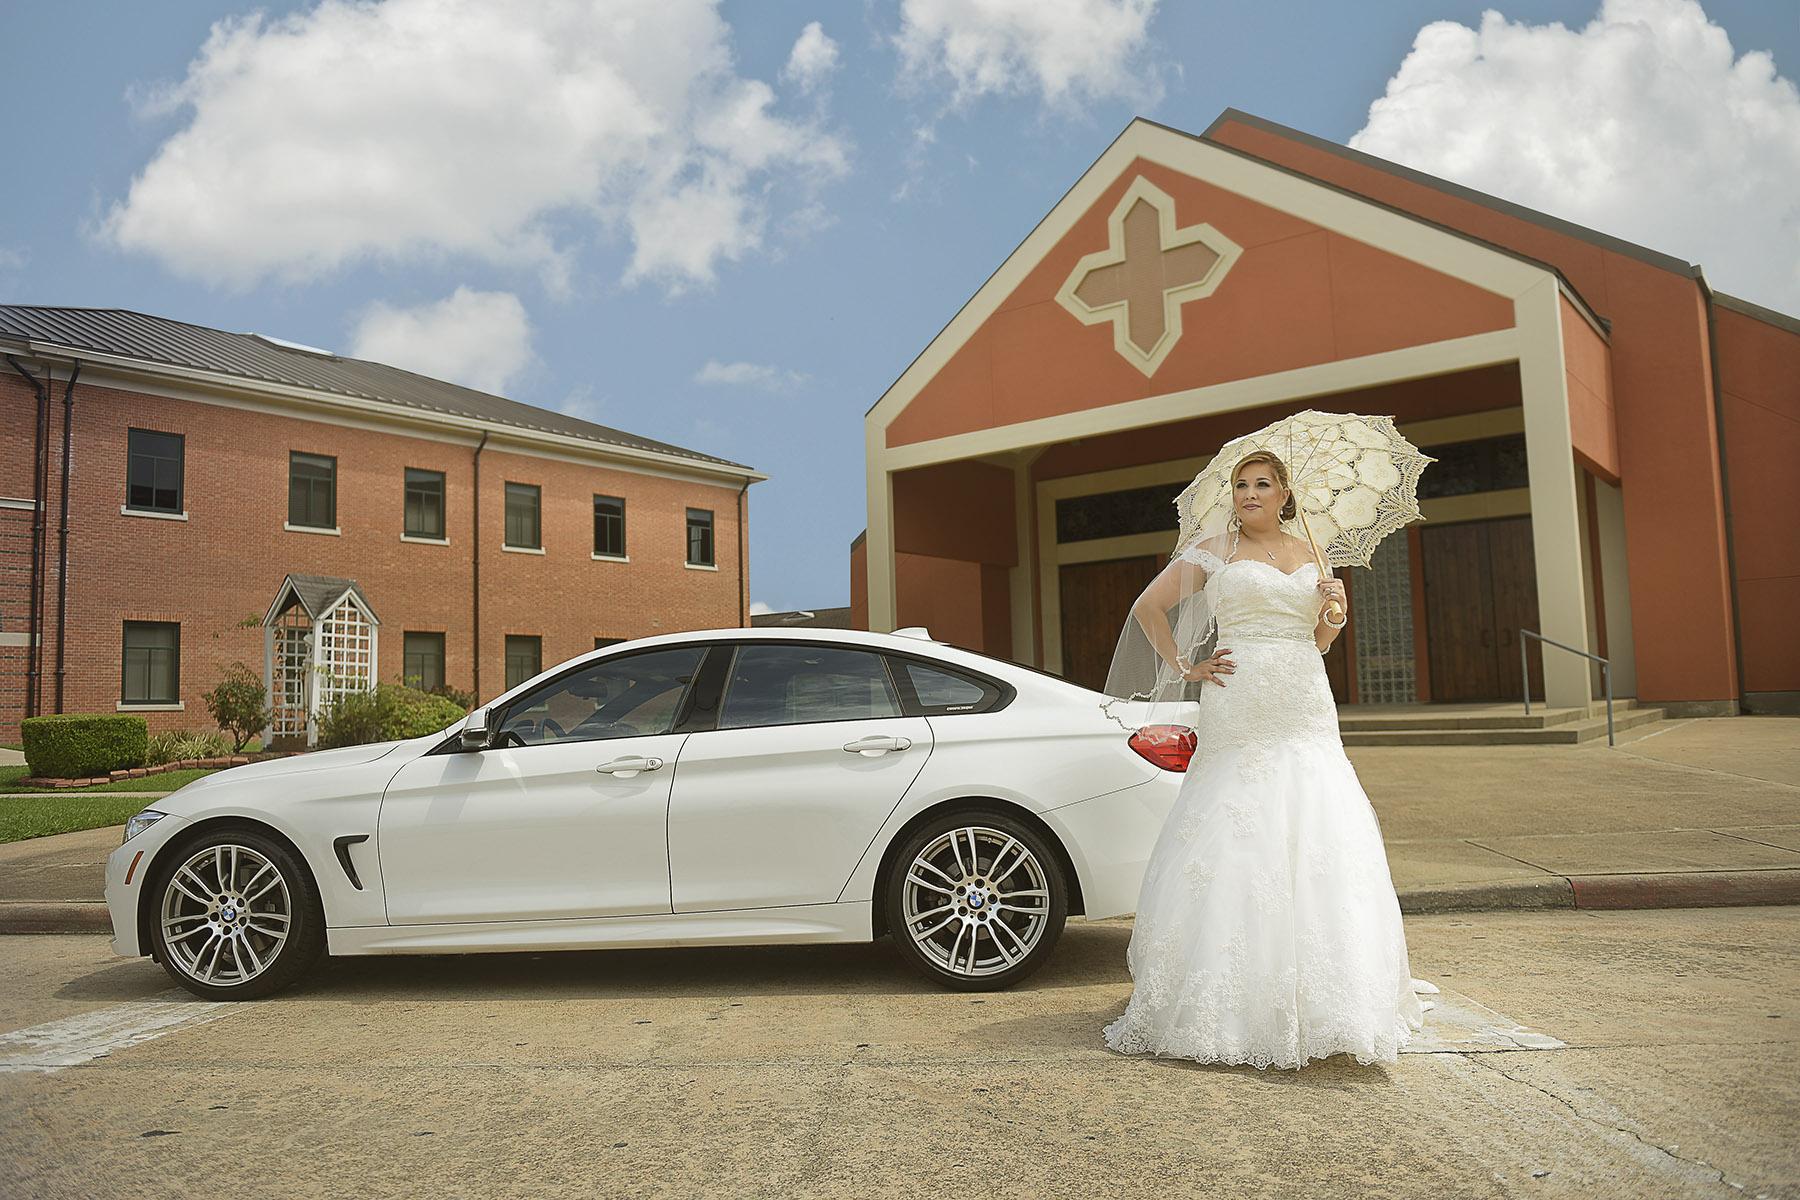 High fashion bridal photo of Lilianna moments before her wedding at St. Theresa Catholic Church in Sugar Land.